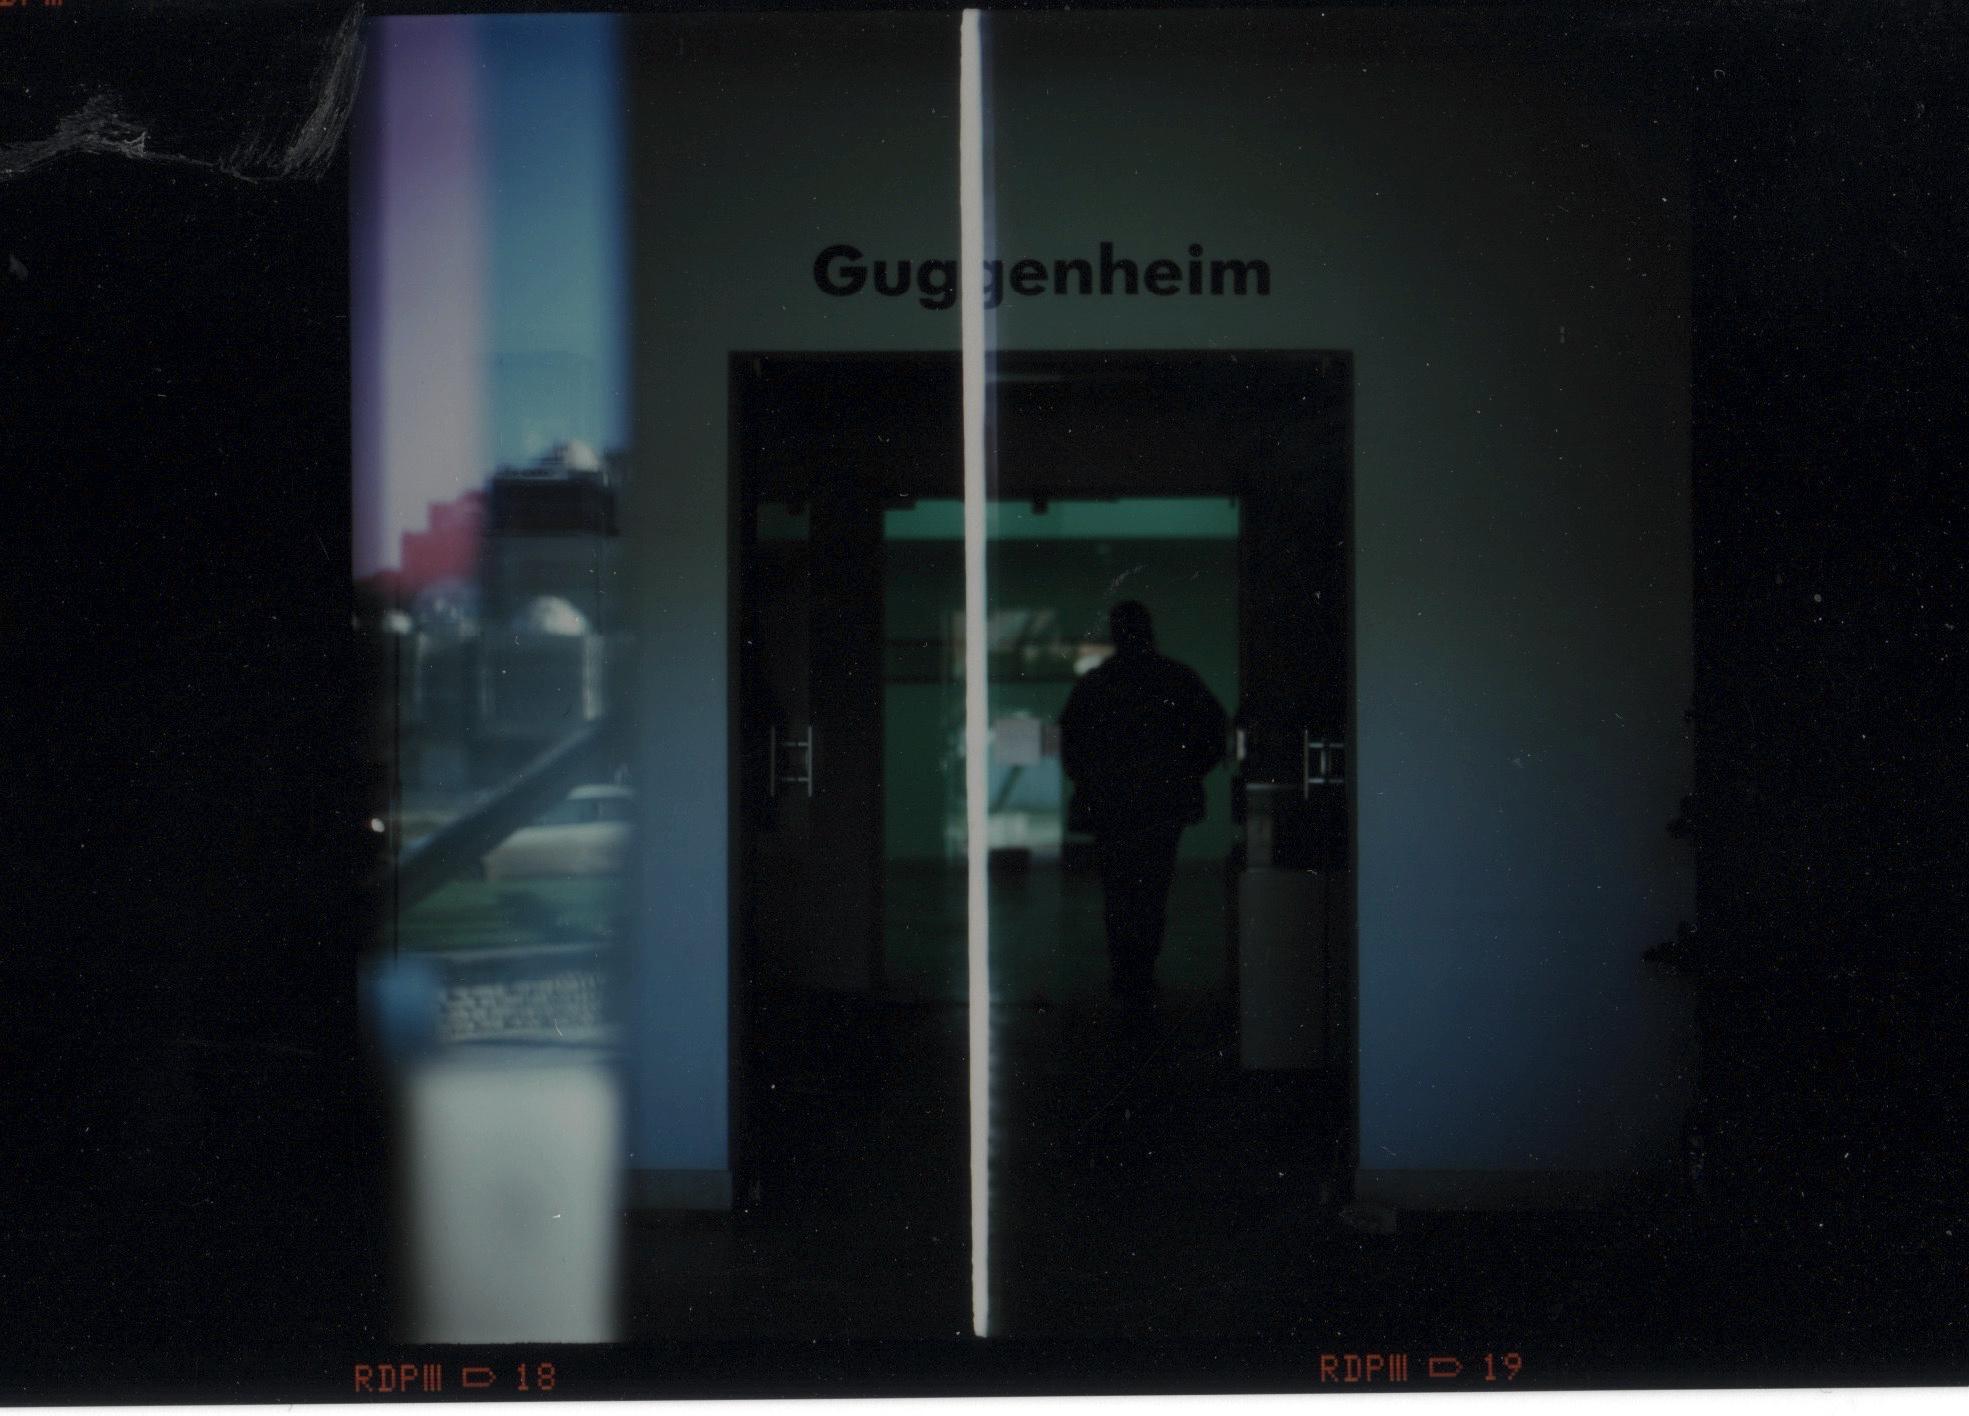 Guggenheim GAK